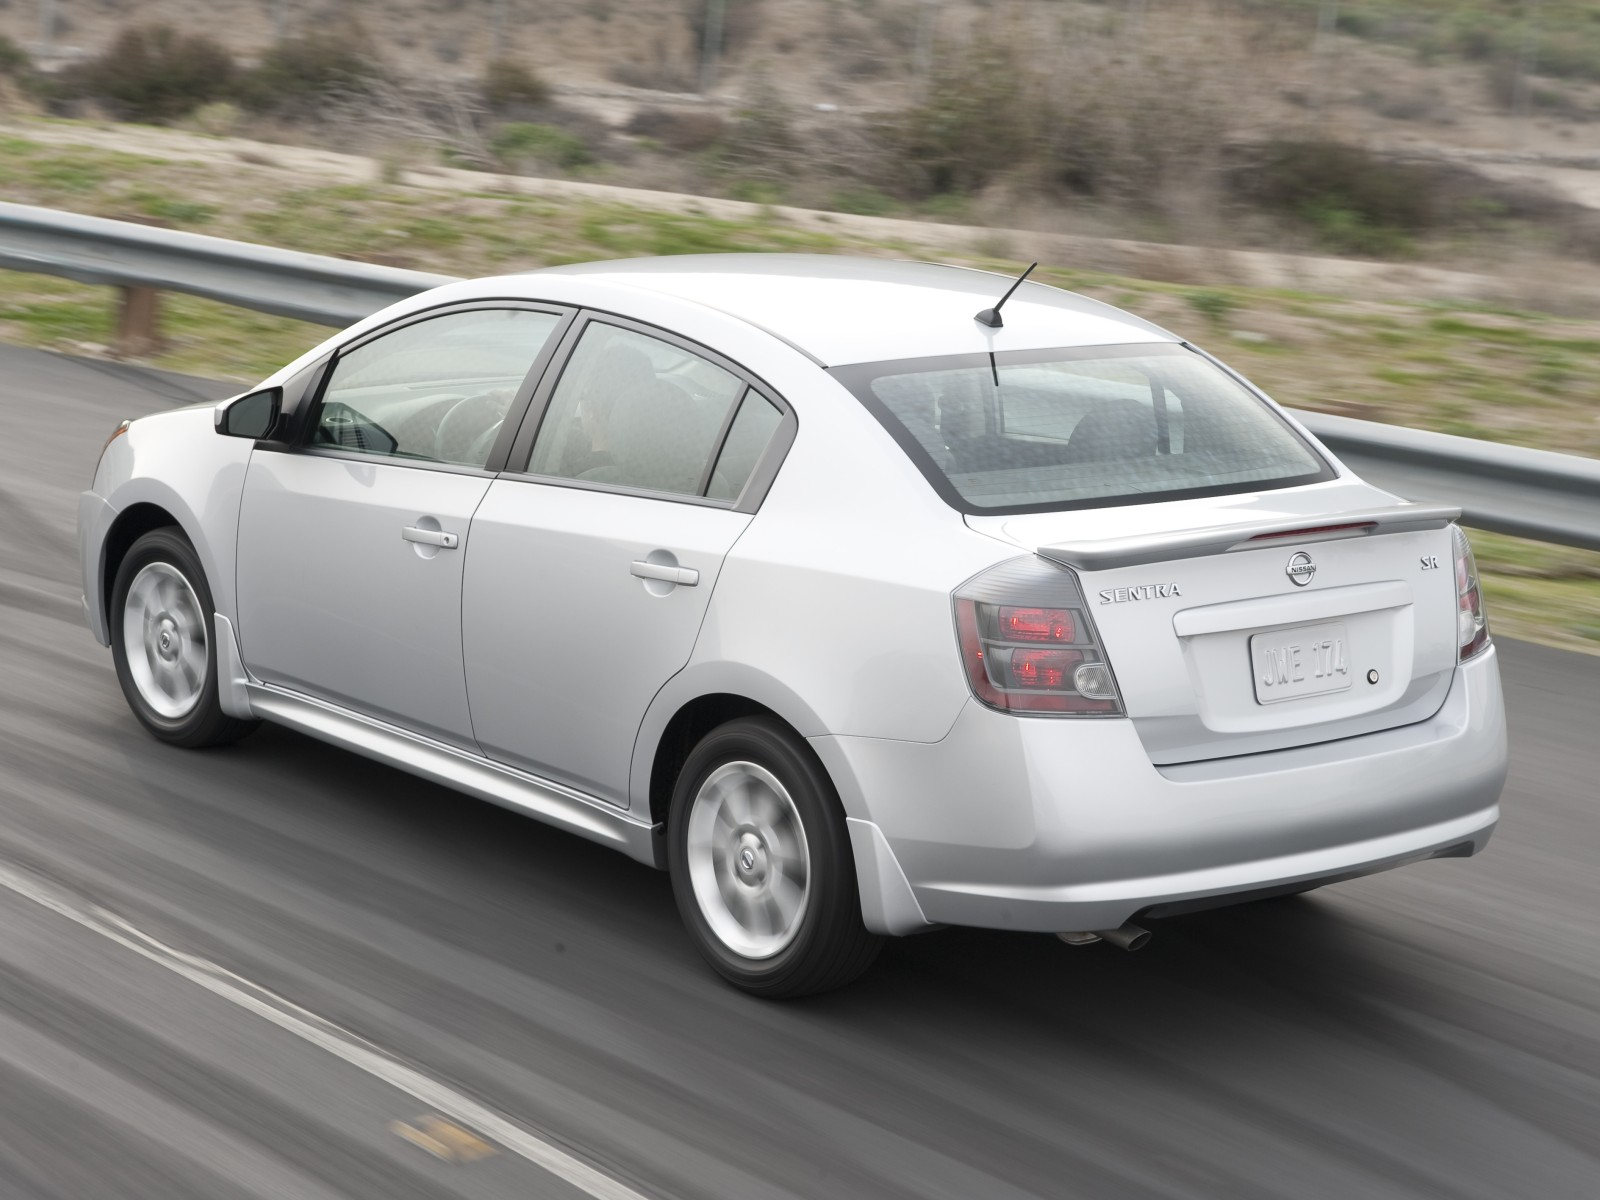 Wonderful 2009 Nissan Sentra SR